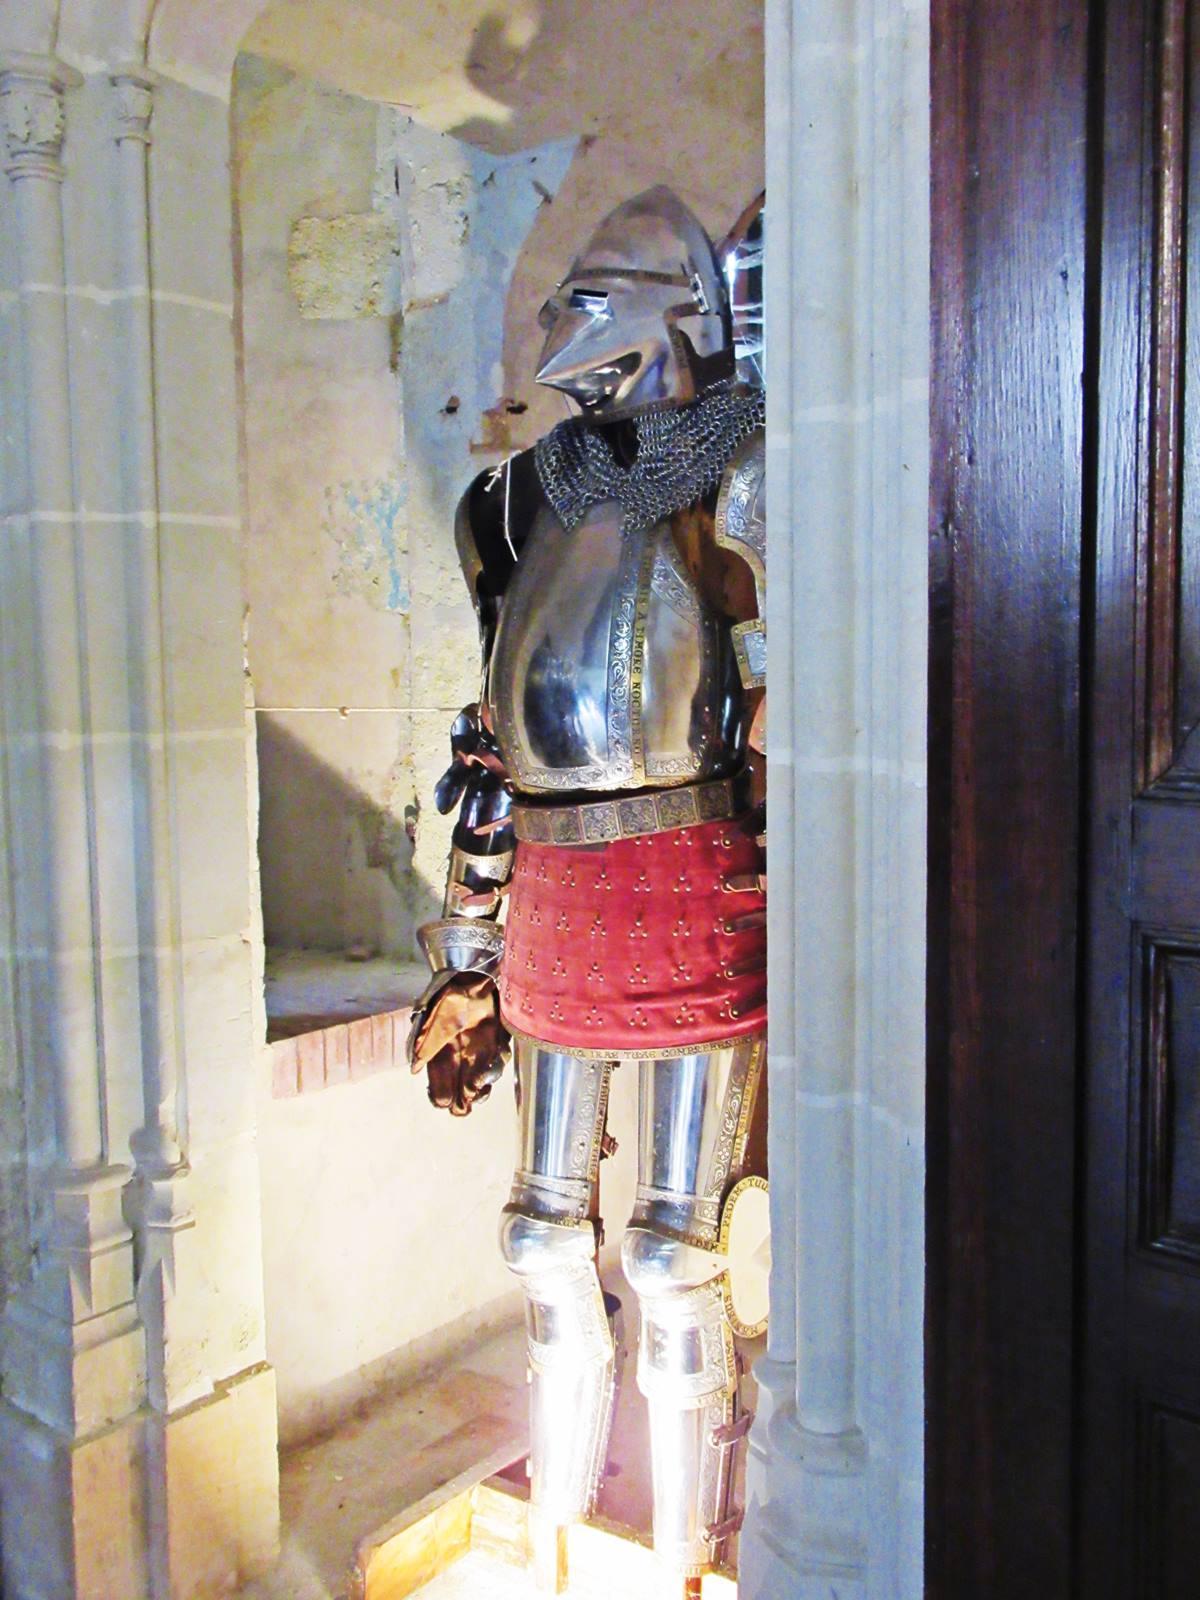 Chateau plessis bourre maine loire tourismechateau du plessis bourre maine loire 14